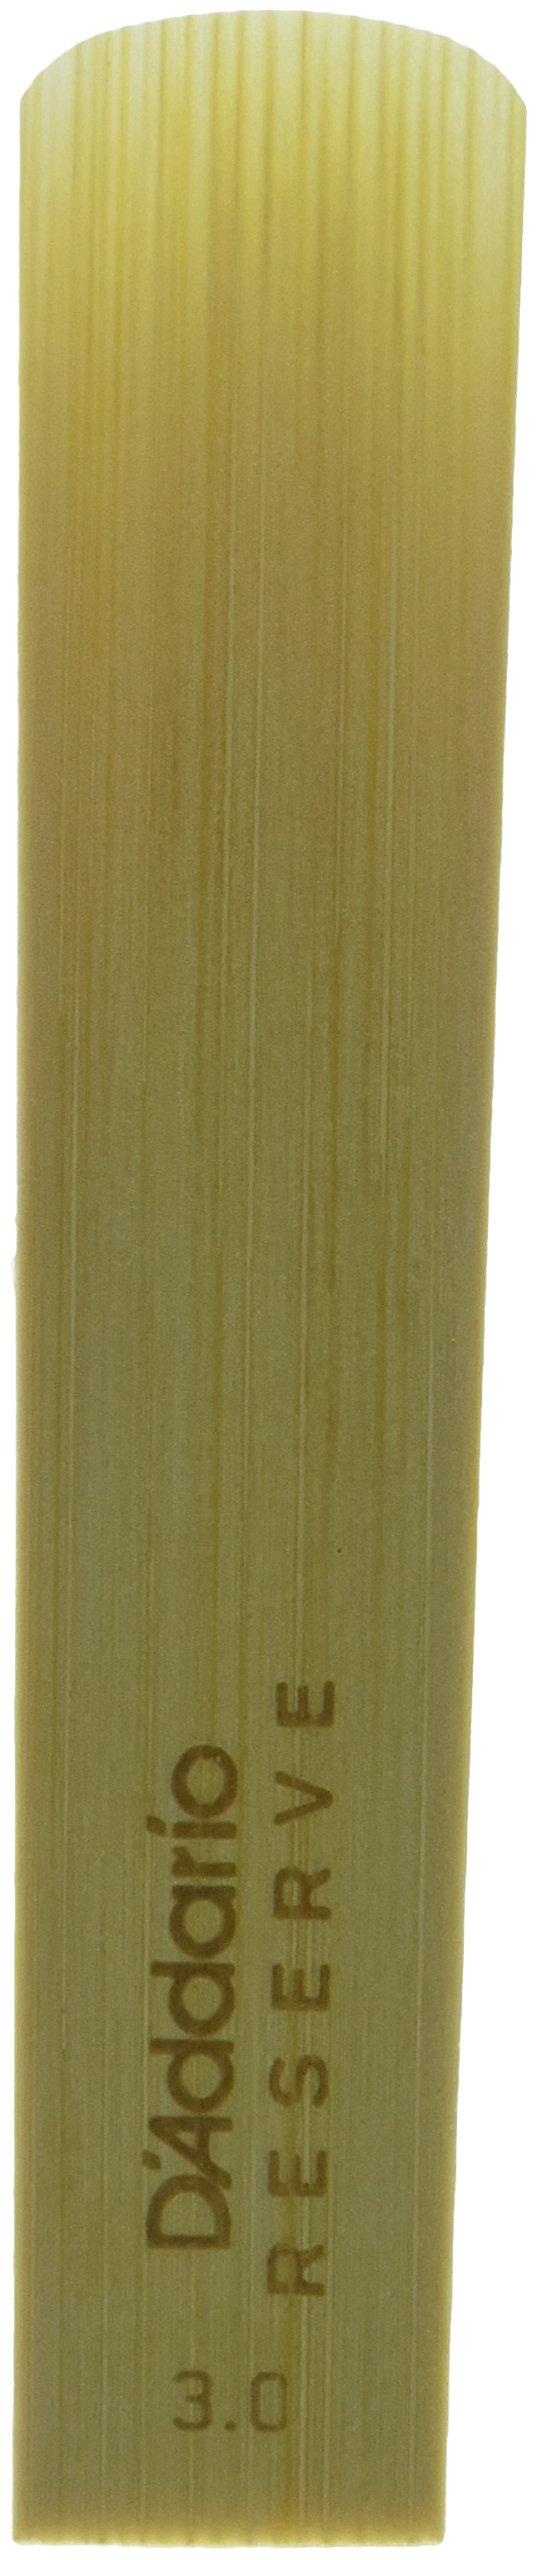 D'Addario Reserve Baritone Saxophone Reeds, Strength 3, 5 pack